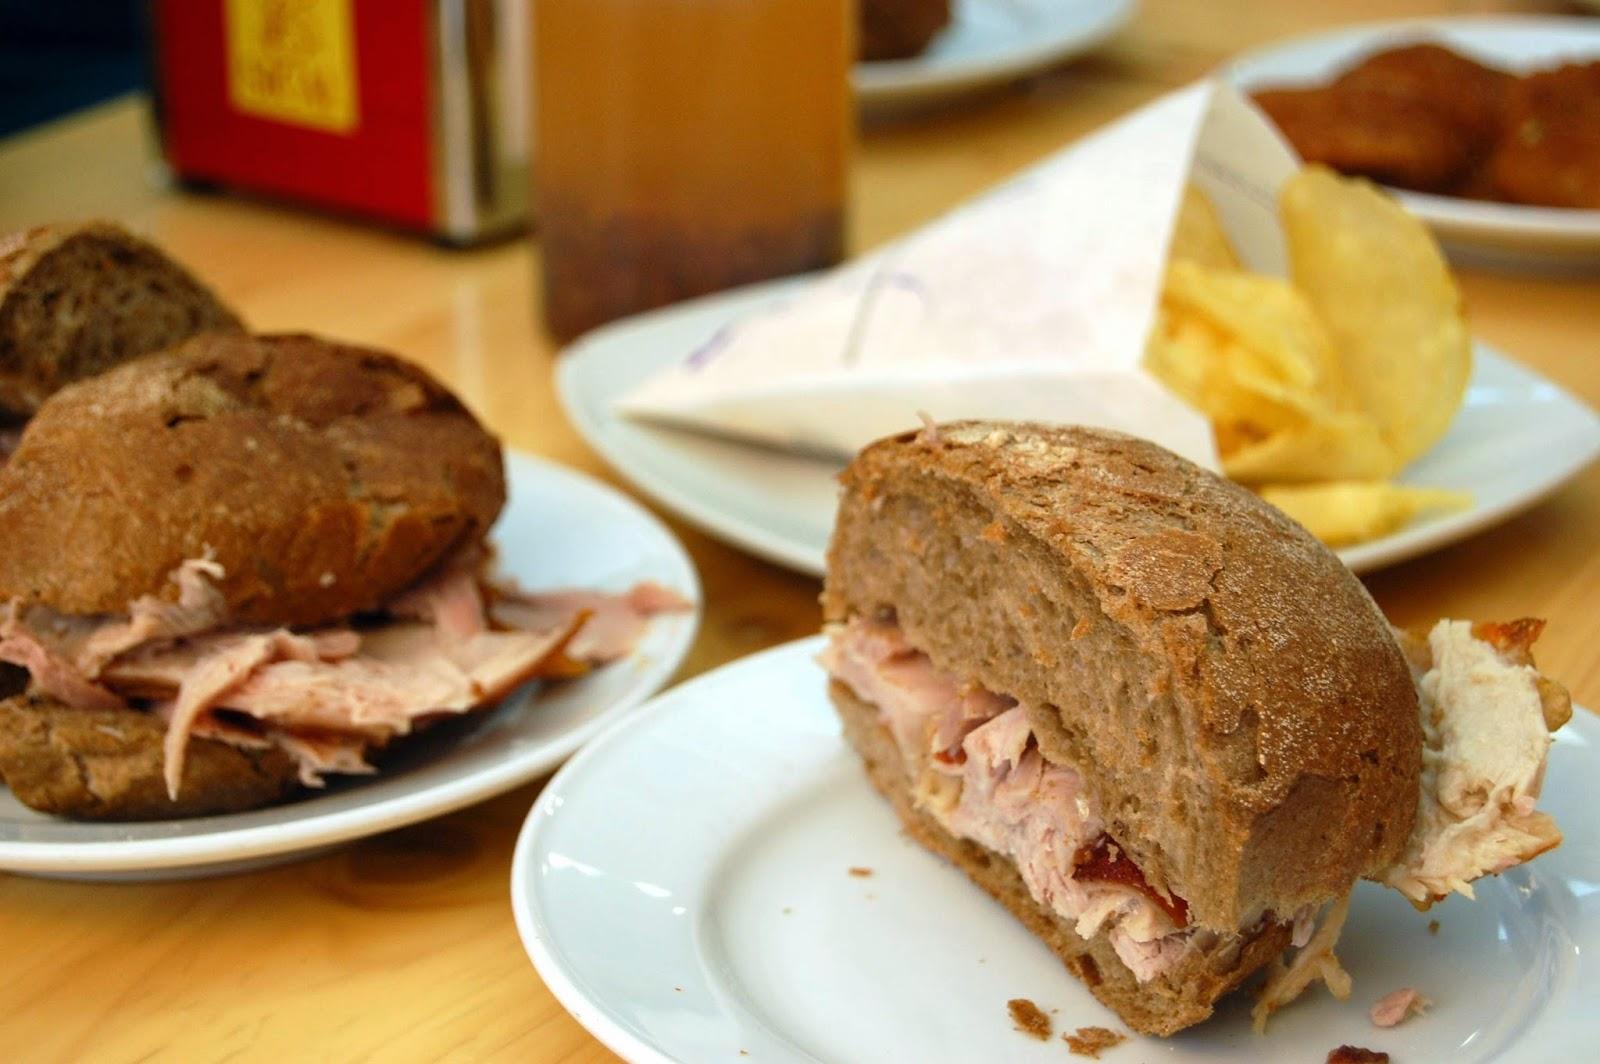 Stitch & Bear - Eat Drink Walk Petiscos Lisbon - Roast suckling pig rolls